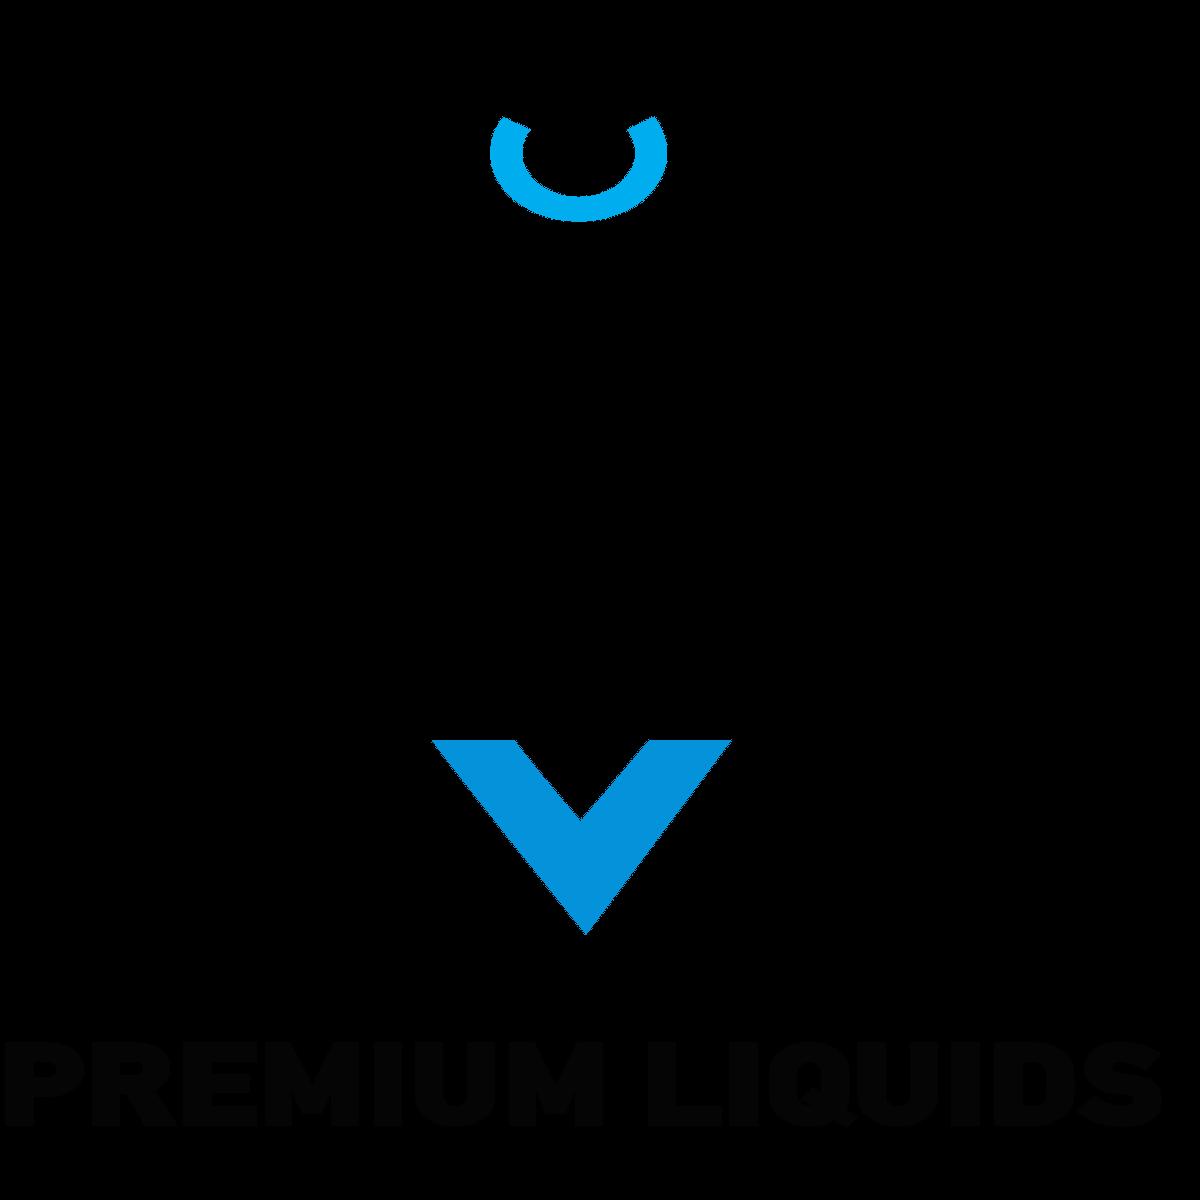 Vnv_liquids_logo_vape-port